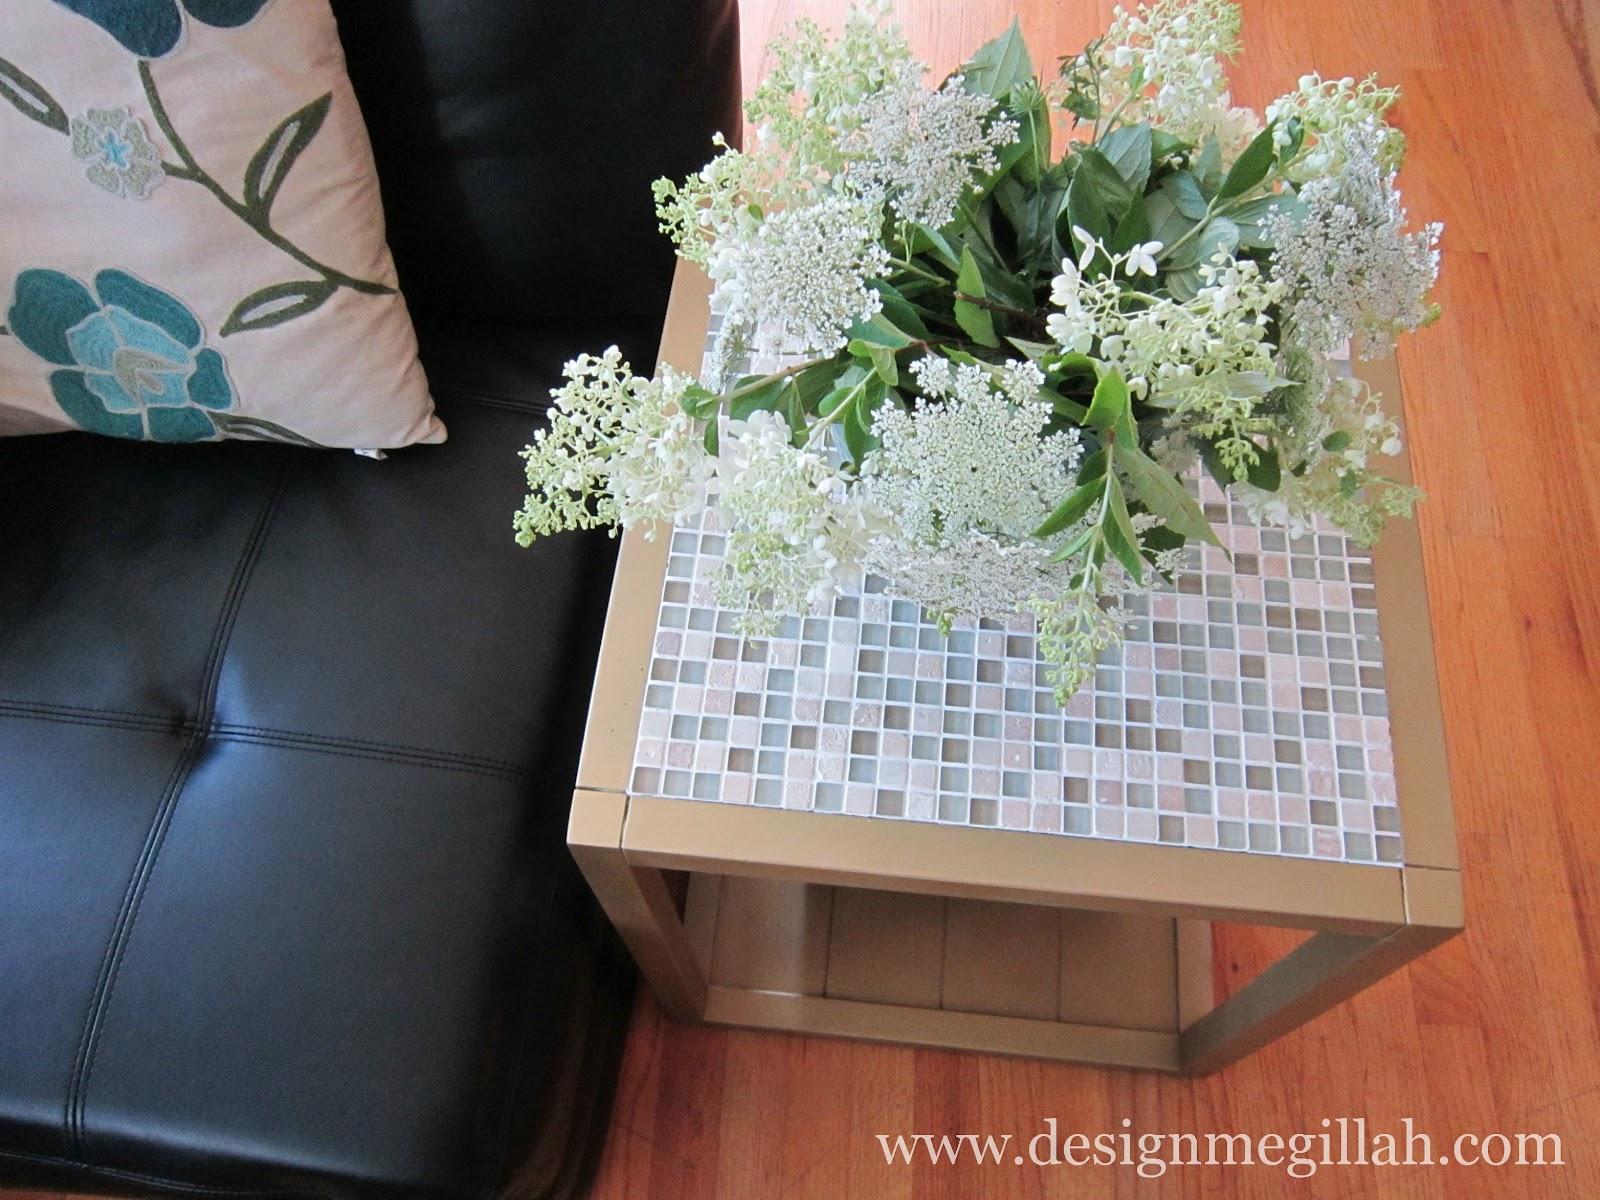 Cute Tiled End Table Makeover u Guest Post by Design Megillah